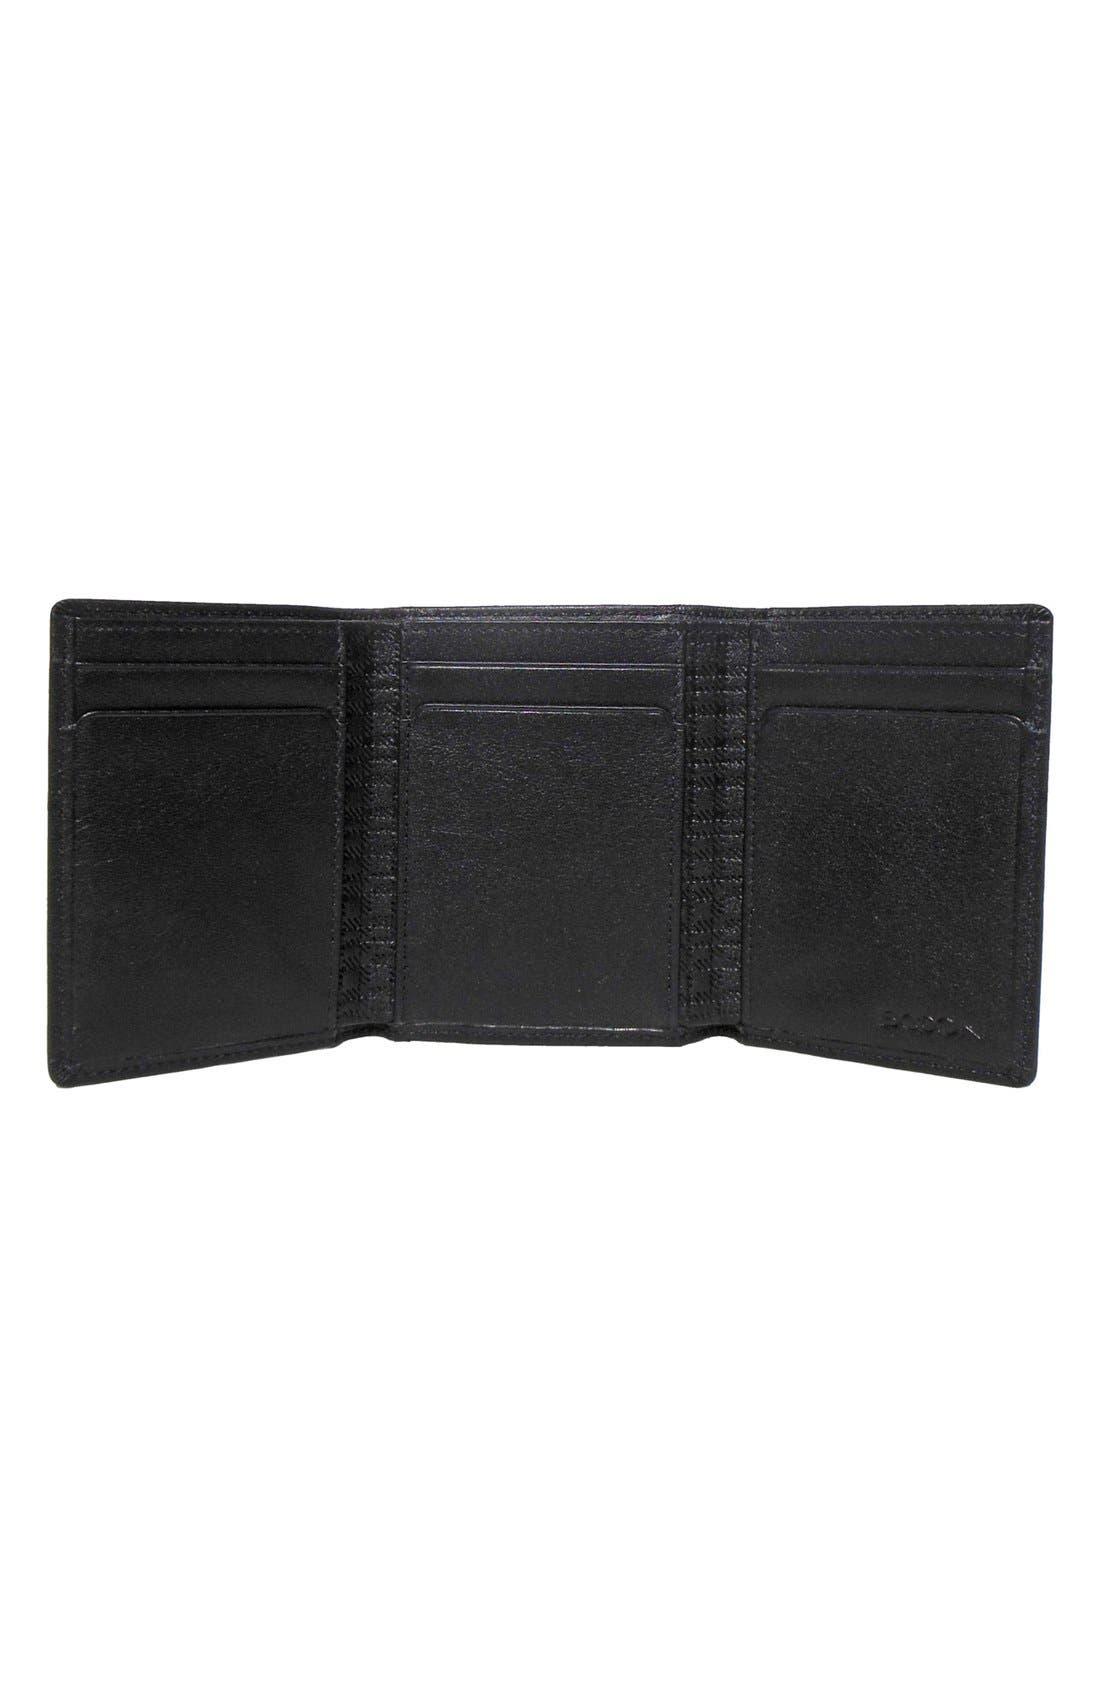 Alternate Image 2  - Boconi 'Grant' RFID Blocker Leather Trifold Wallet